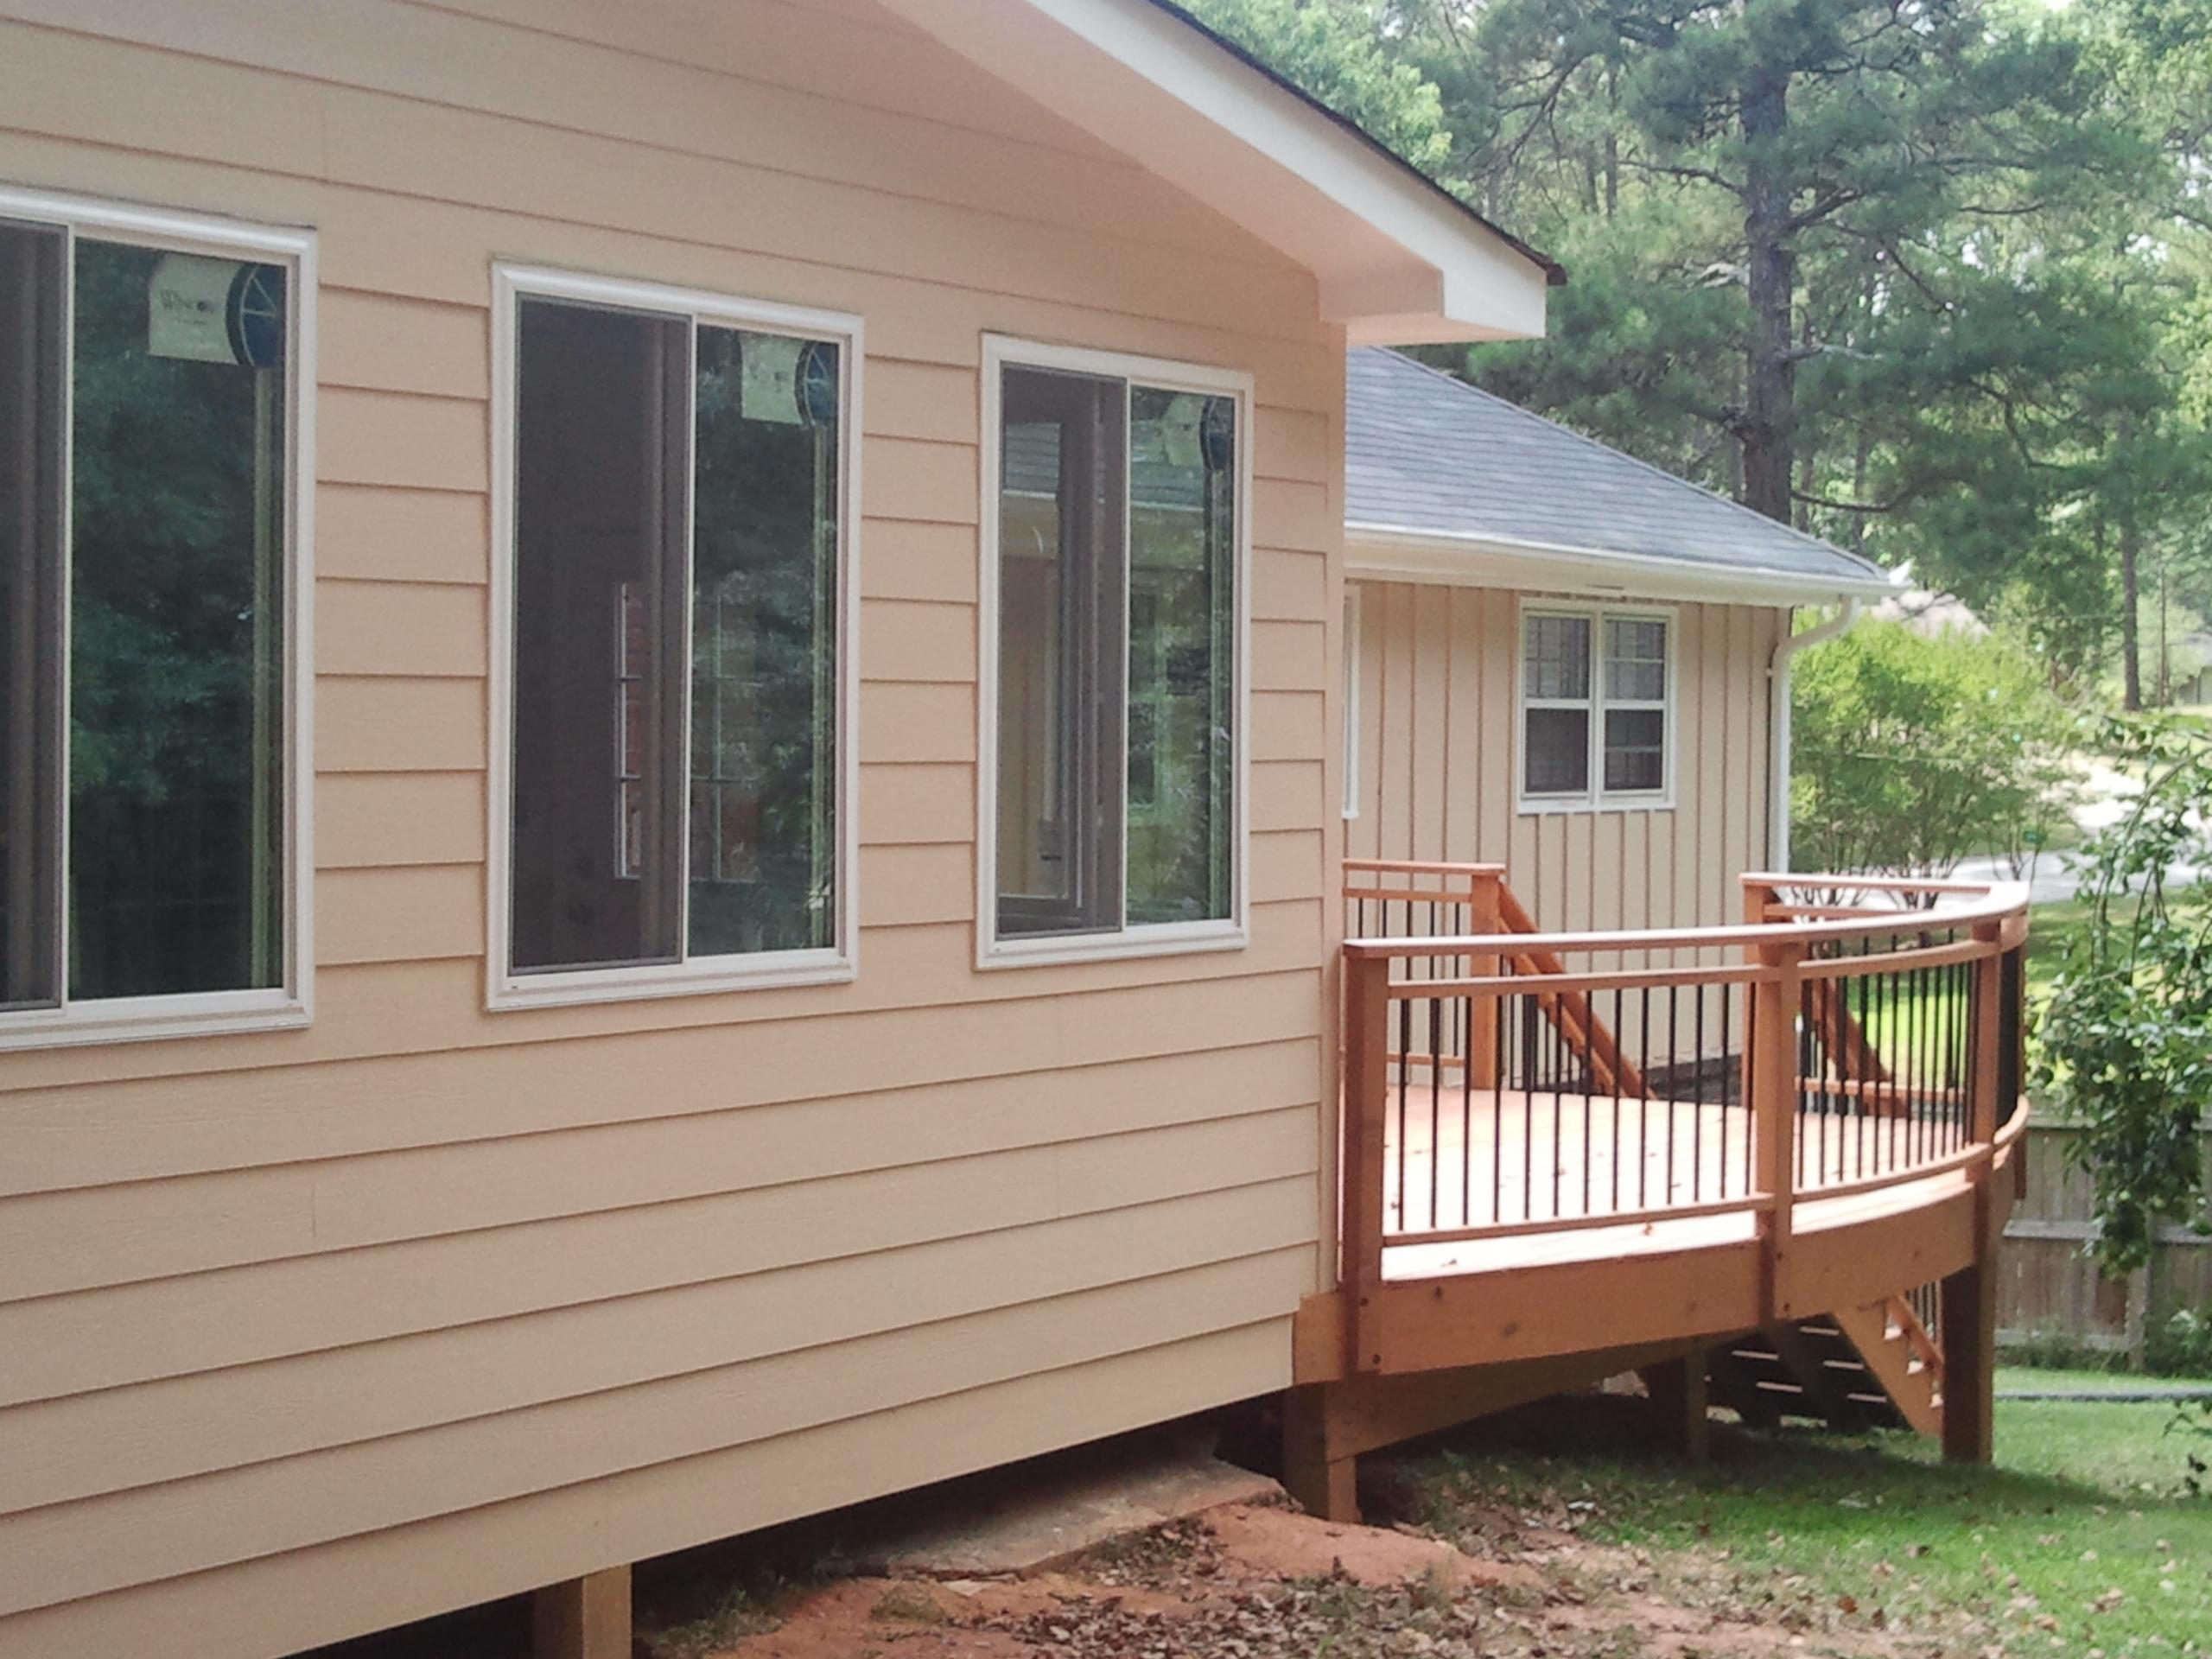 sunroom and bowed porch.jpg